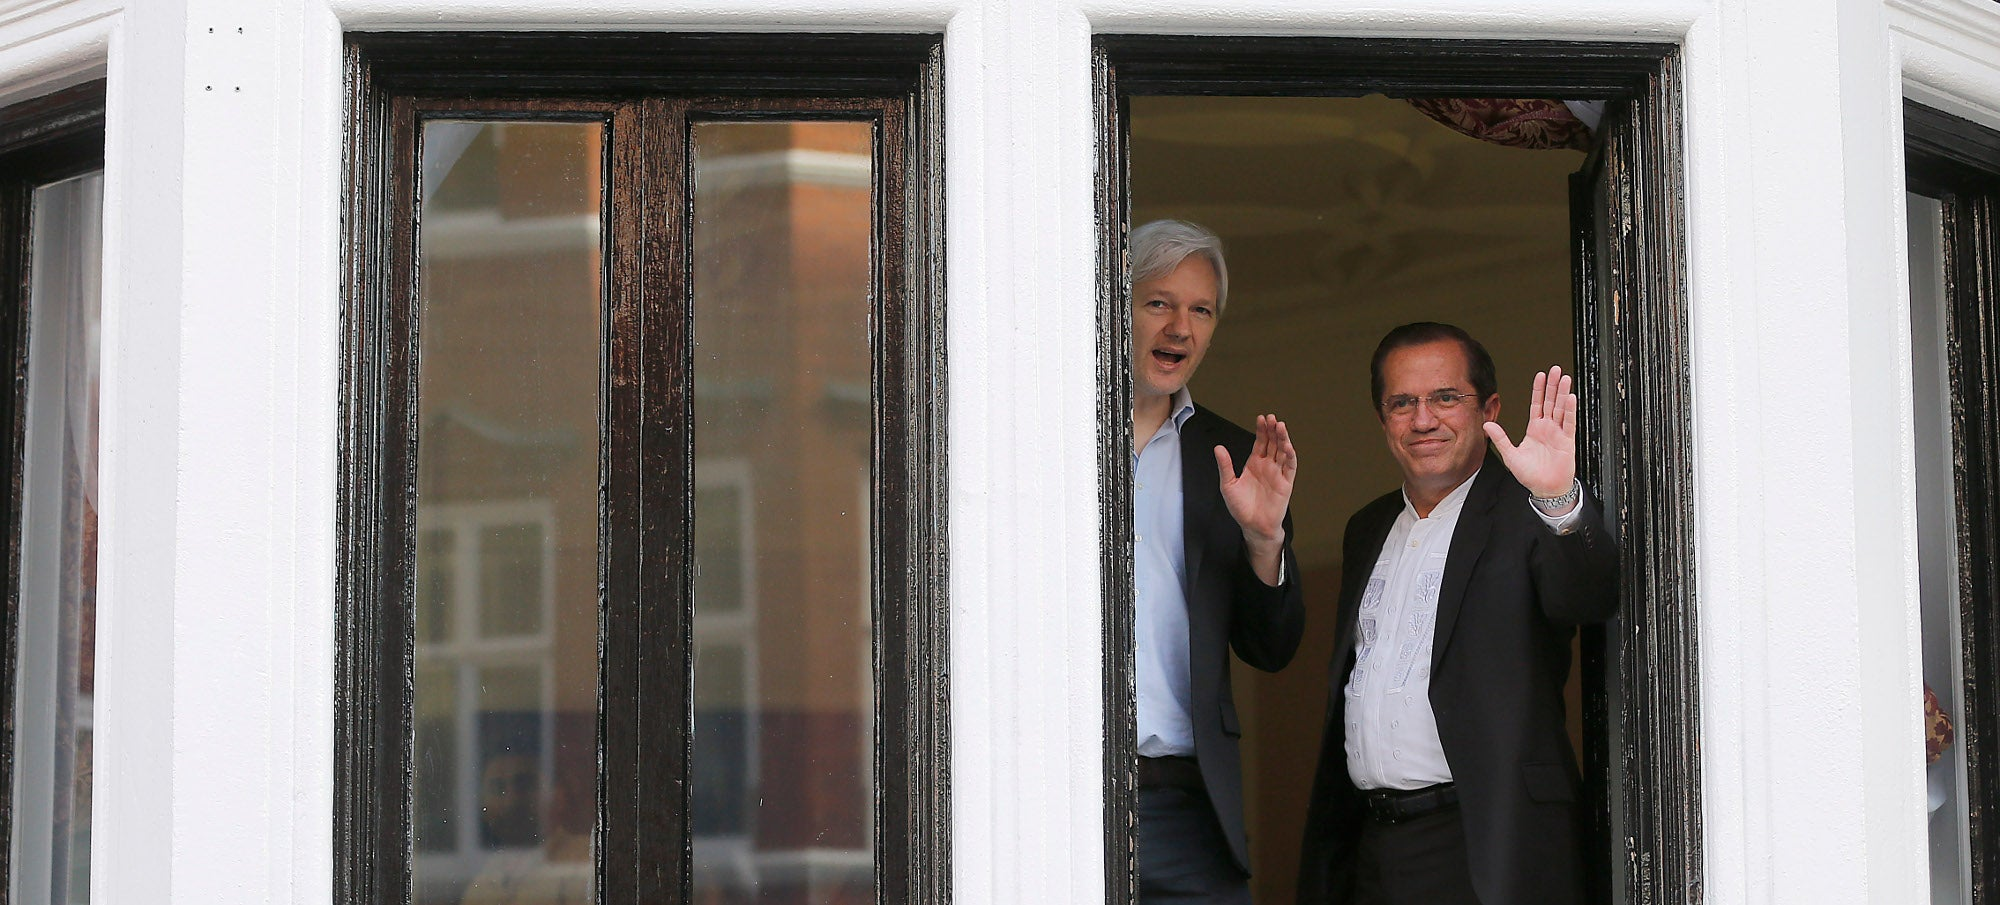 BBC: UN Panel Believes Julian Assange Was 'Unlawfully Detained'